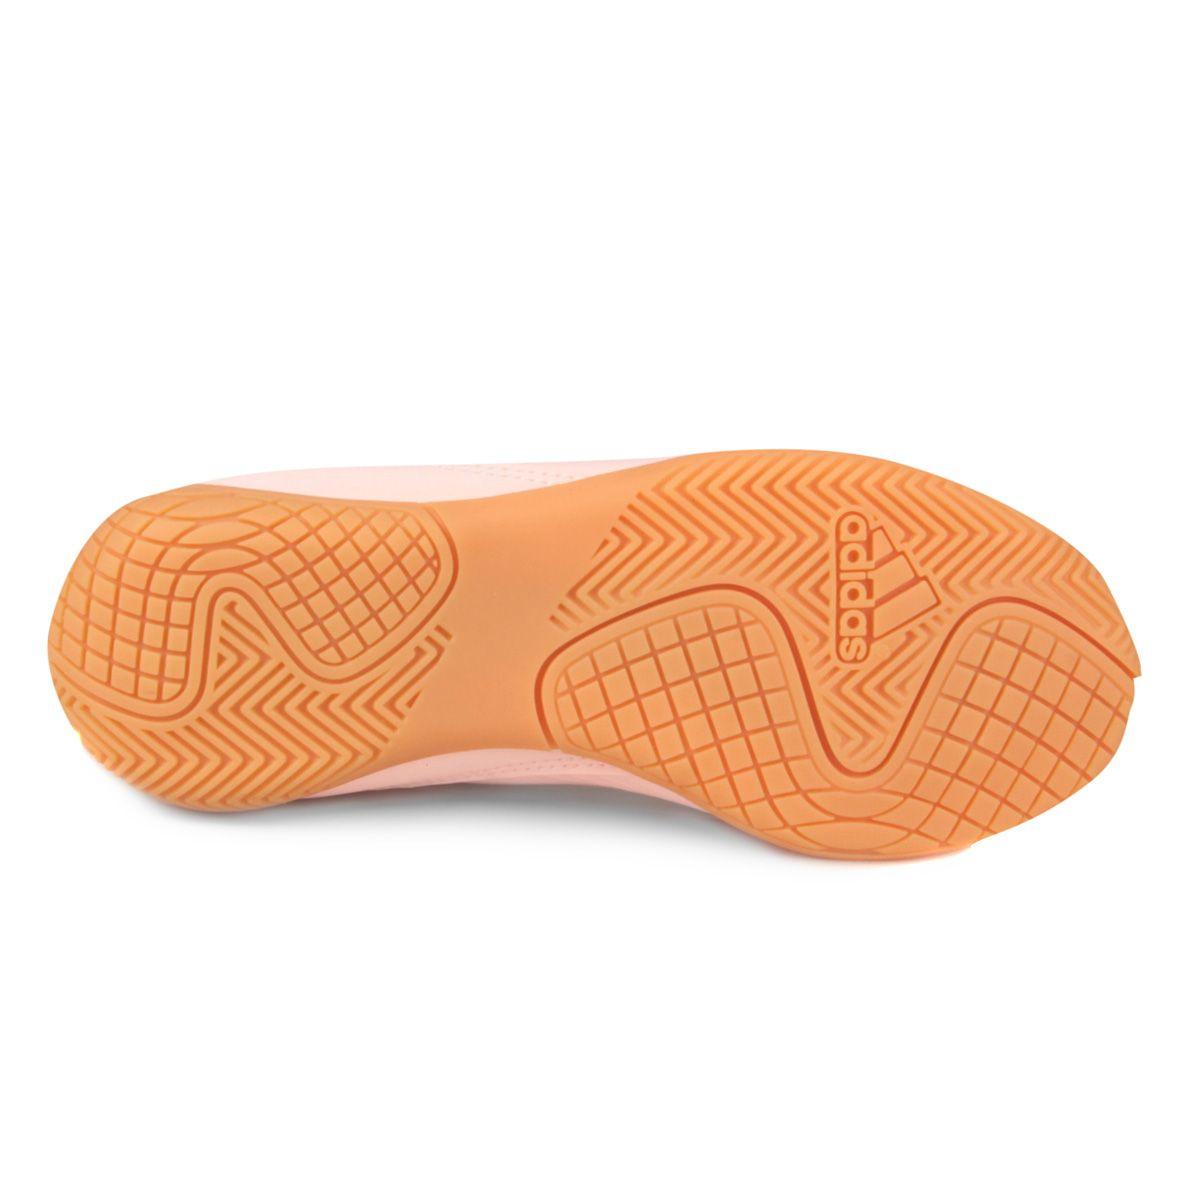 c62d7d383 Chuteira Futsal Infantil Adidas Predator 18 3 IN - Compre Agora | Netshoes